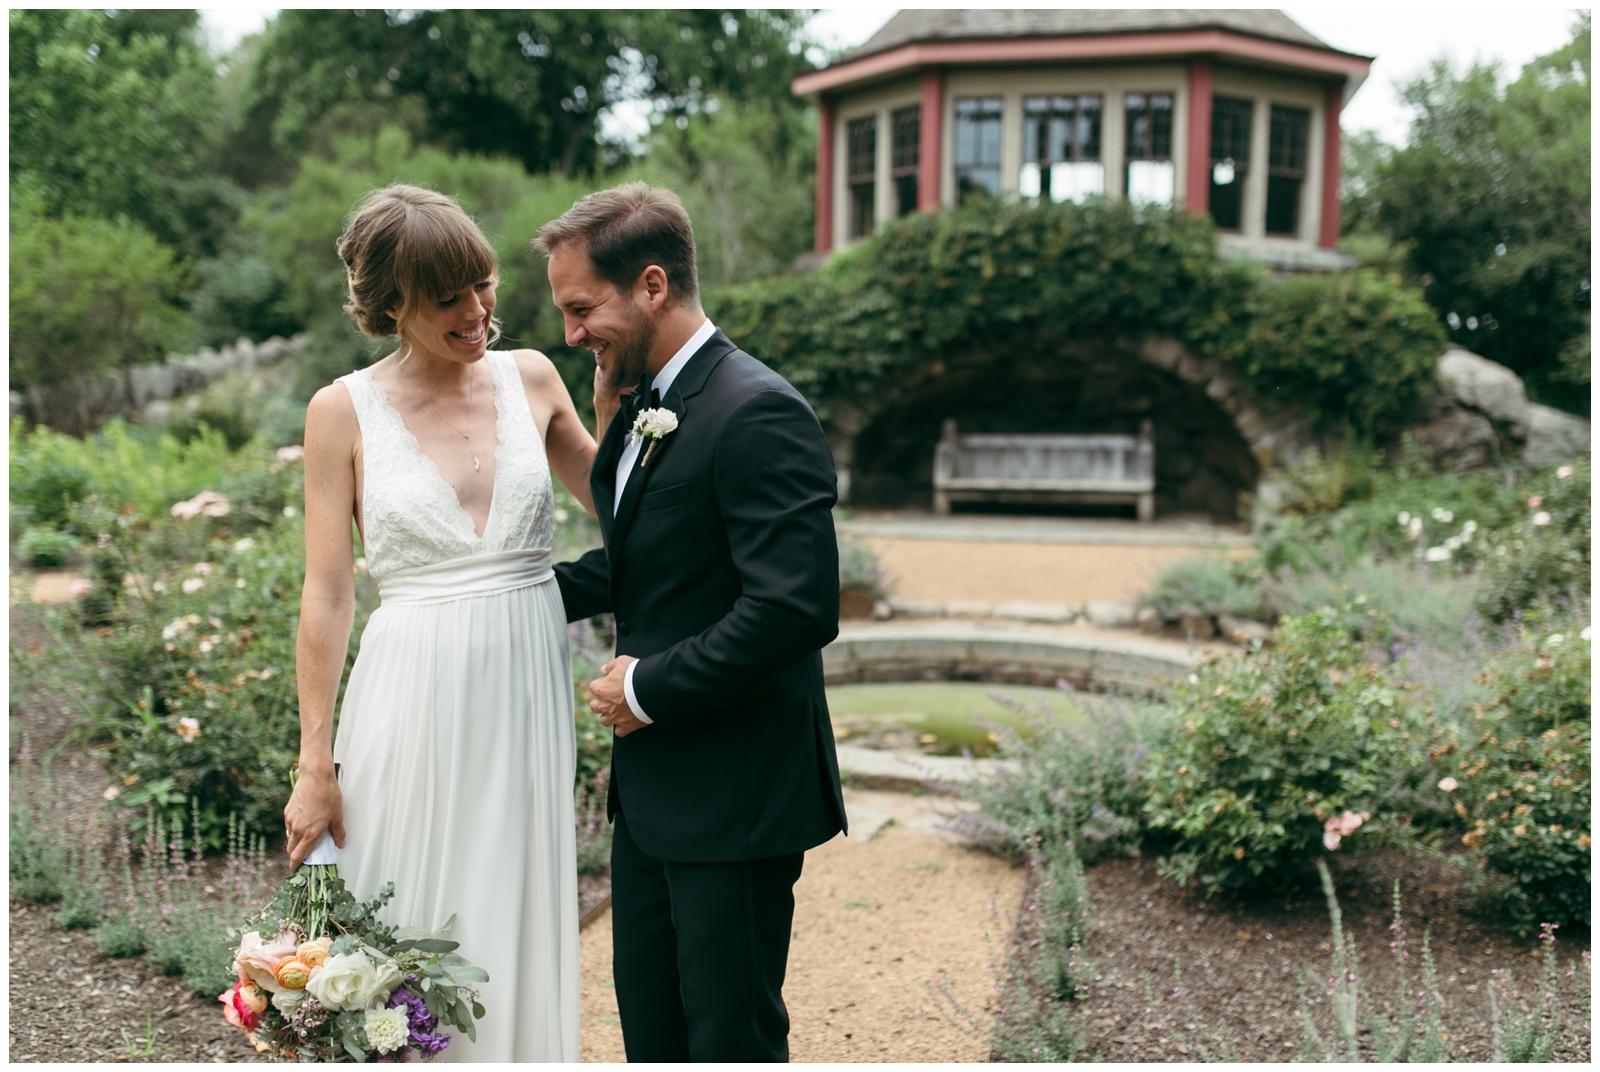 Moraine-Farm-wedding-Bailey-Q-Photo-Massachusetts-wedding-photpgrapher-027.jpg